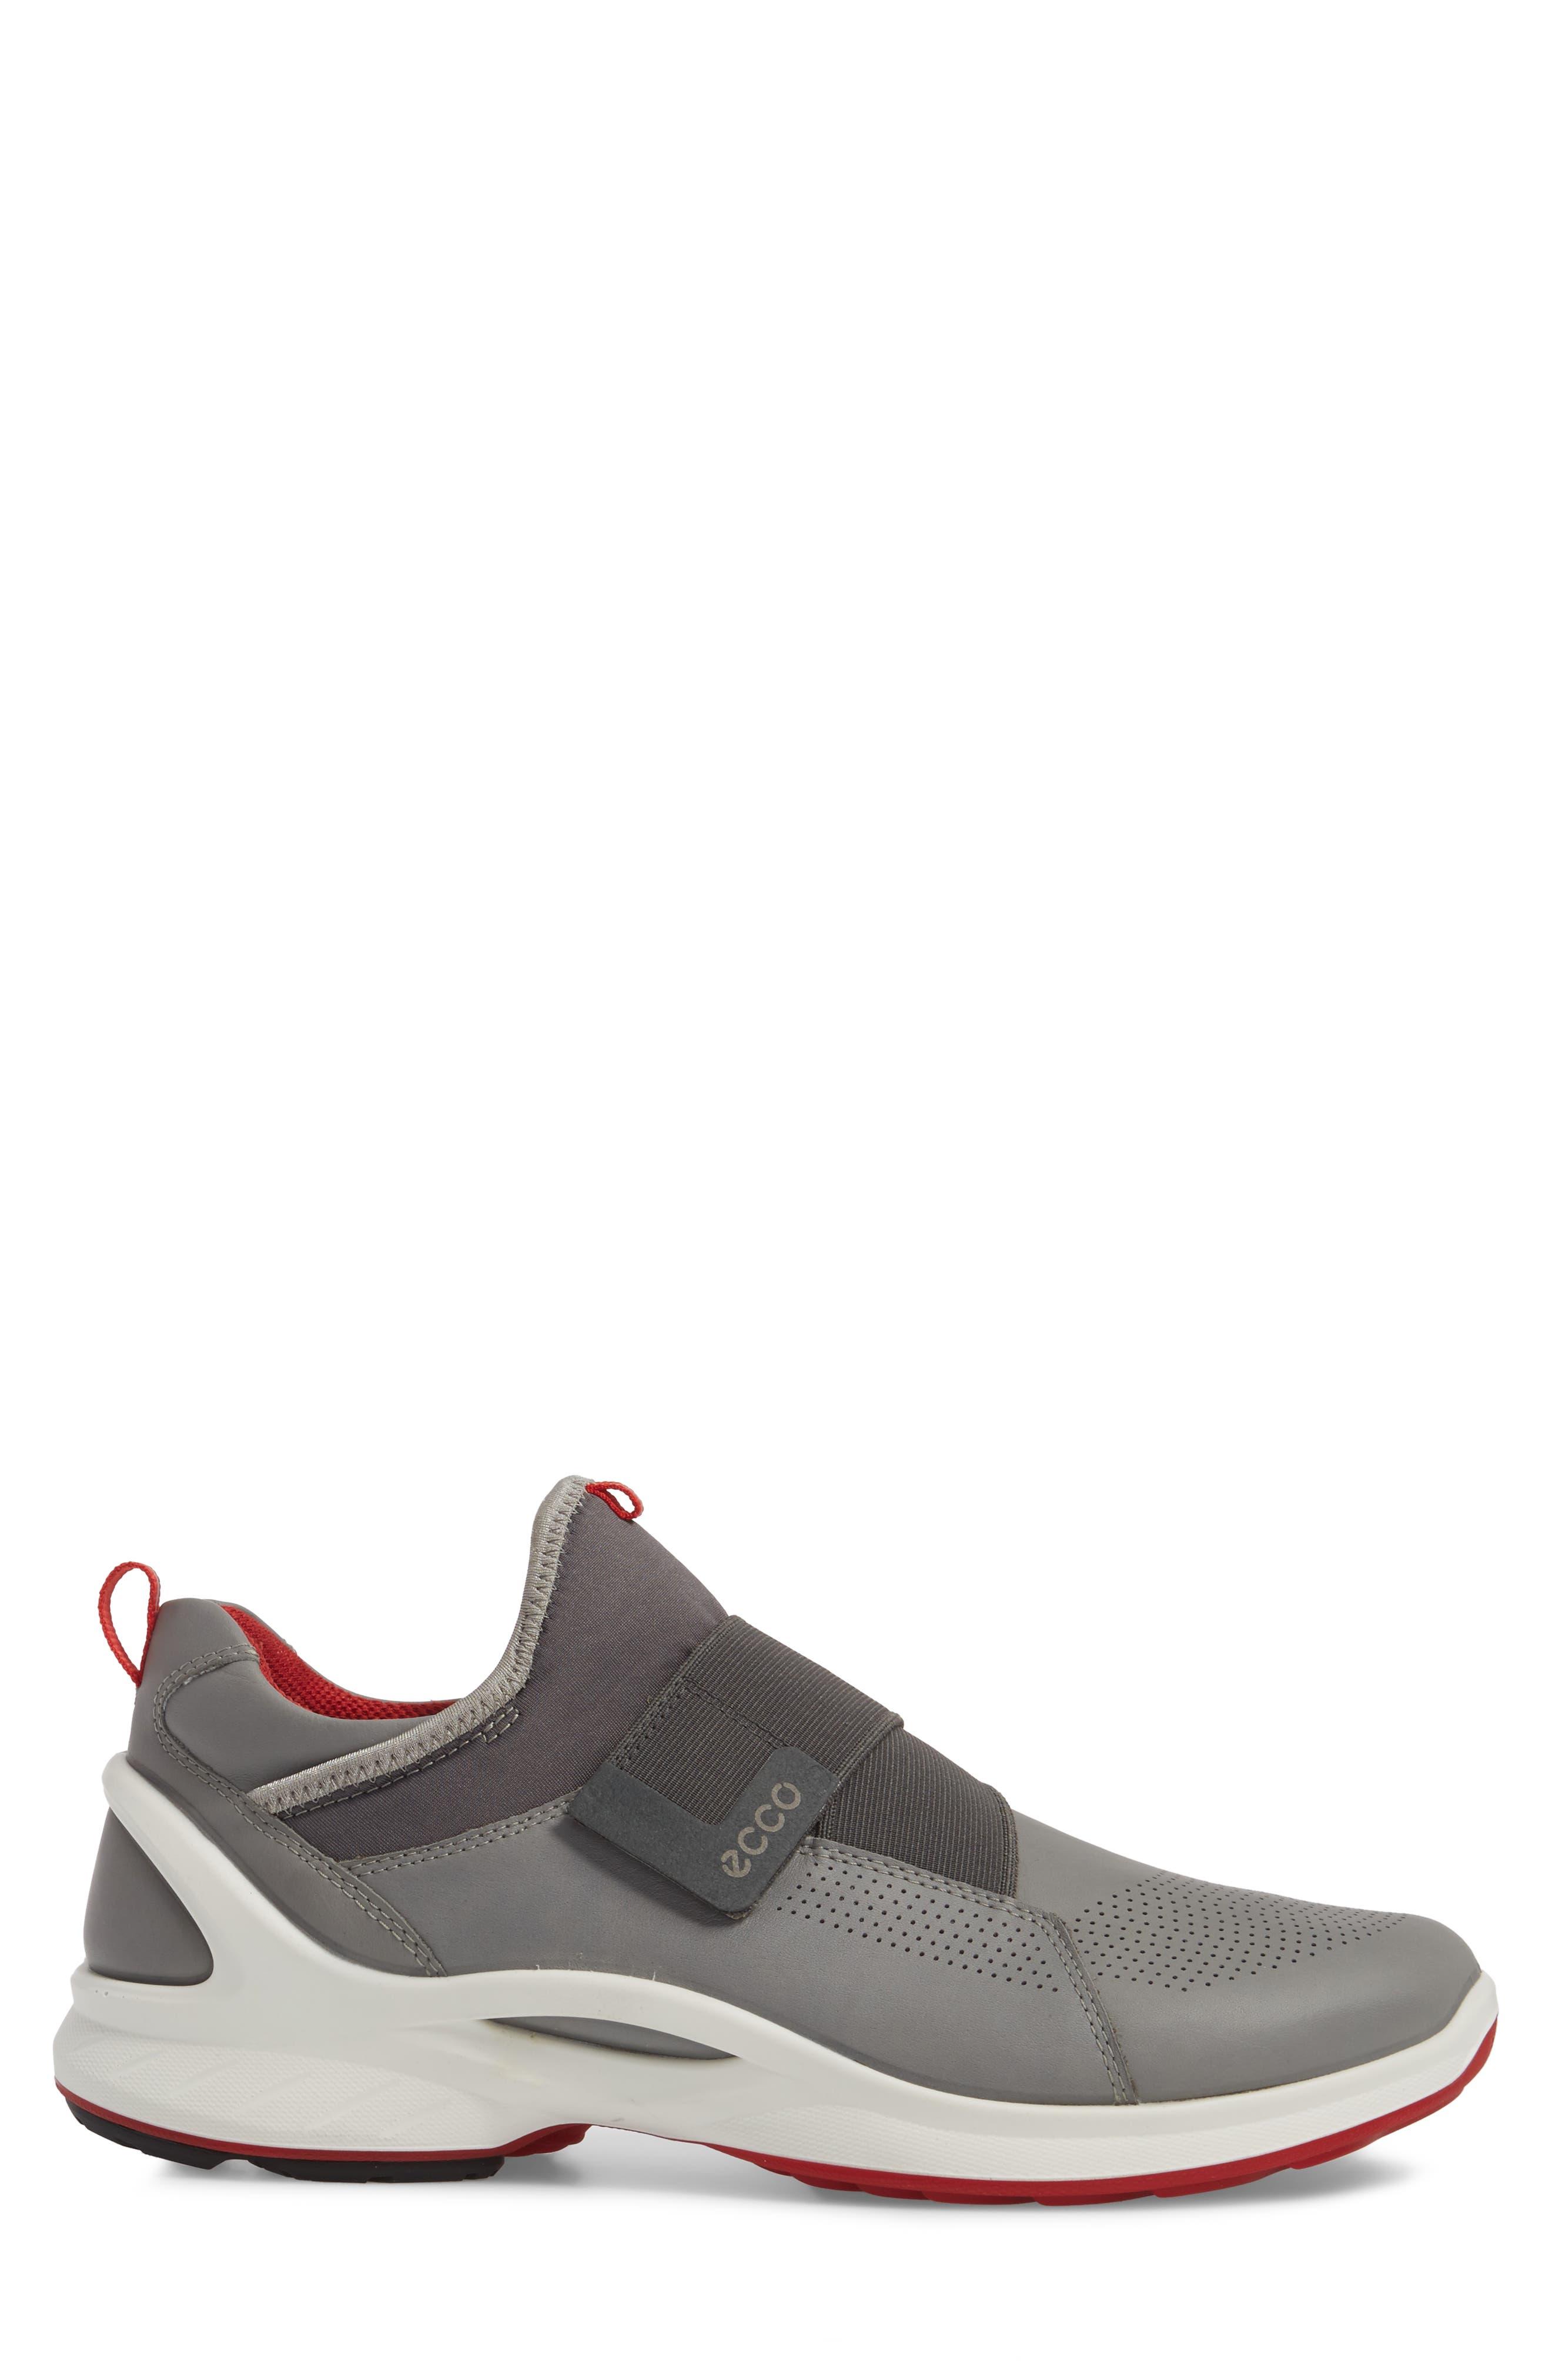 BIOM Fjuel Band Sneaker,                             Alternate thumbnail 3, color,                             Dark Shadow/ Titanium Leather